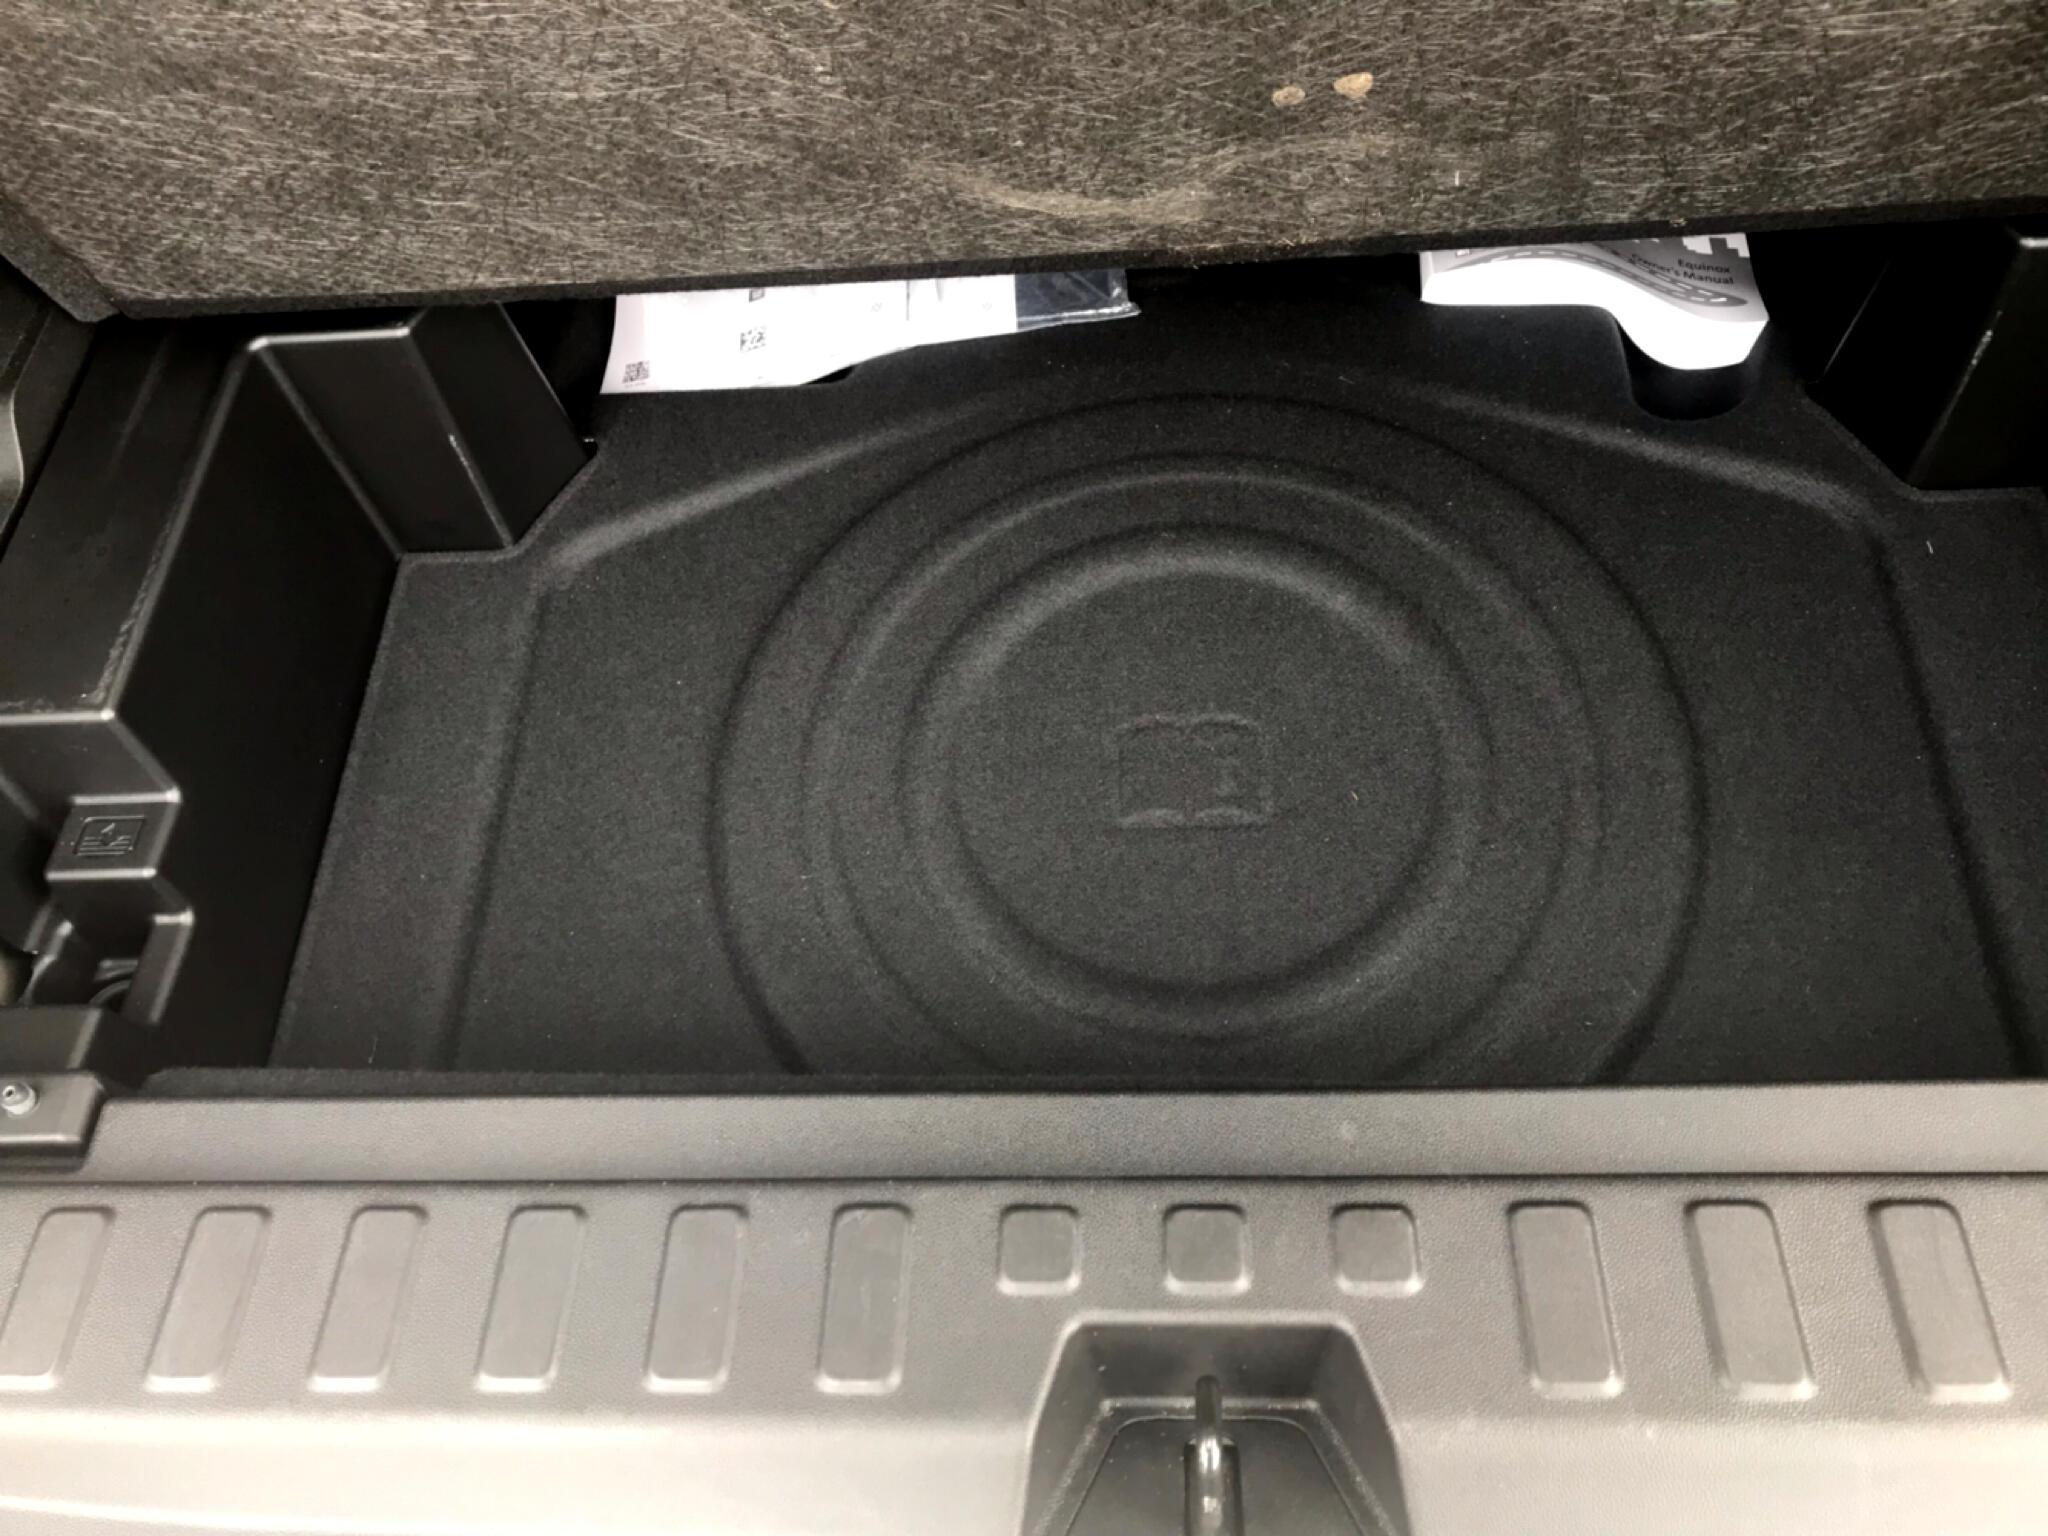 2019 Chevrolet Equinox LT FWD 4 dr 1.5 Liter l4